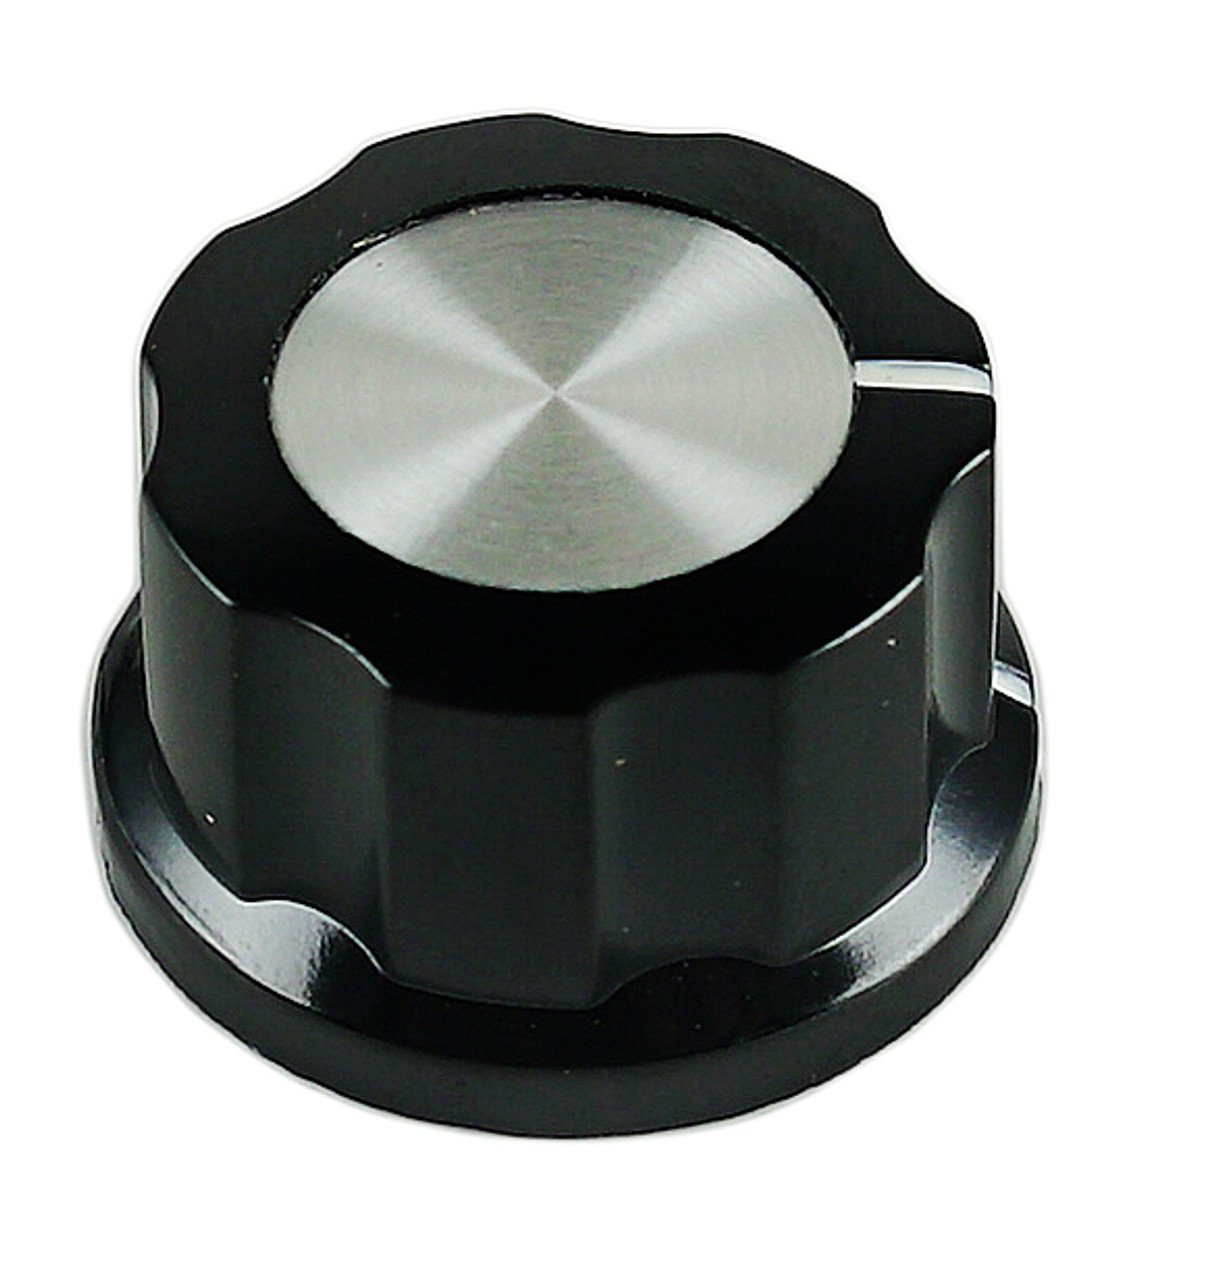 Black Knob Replacement for Rainbowair Ozone Generators